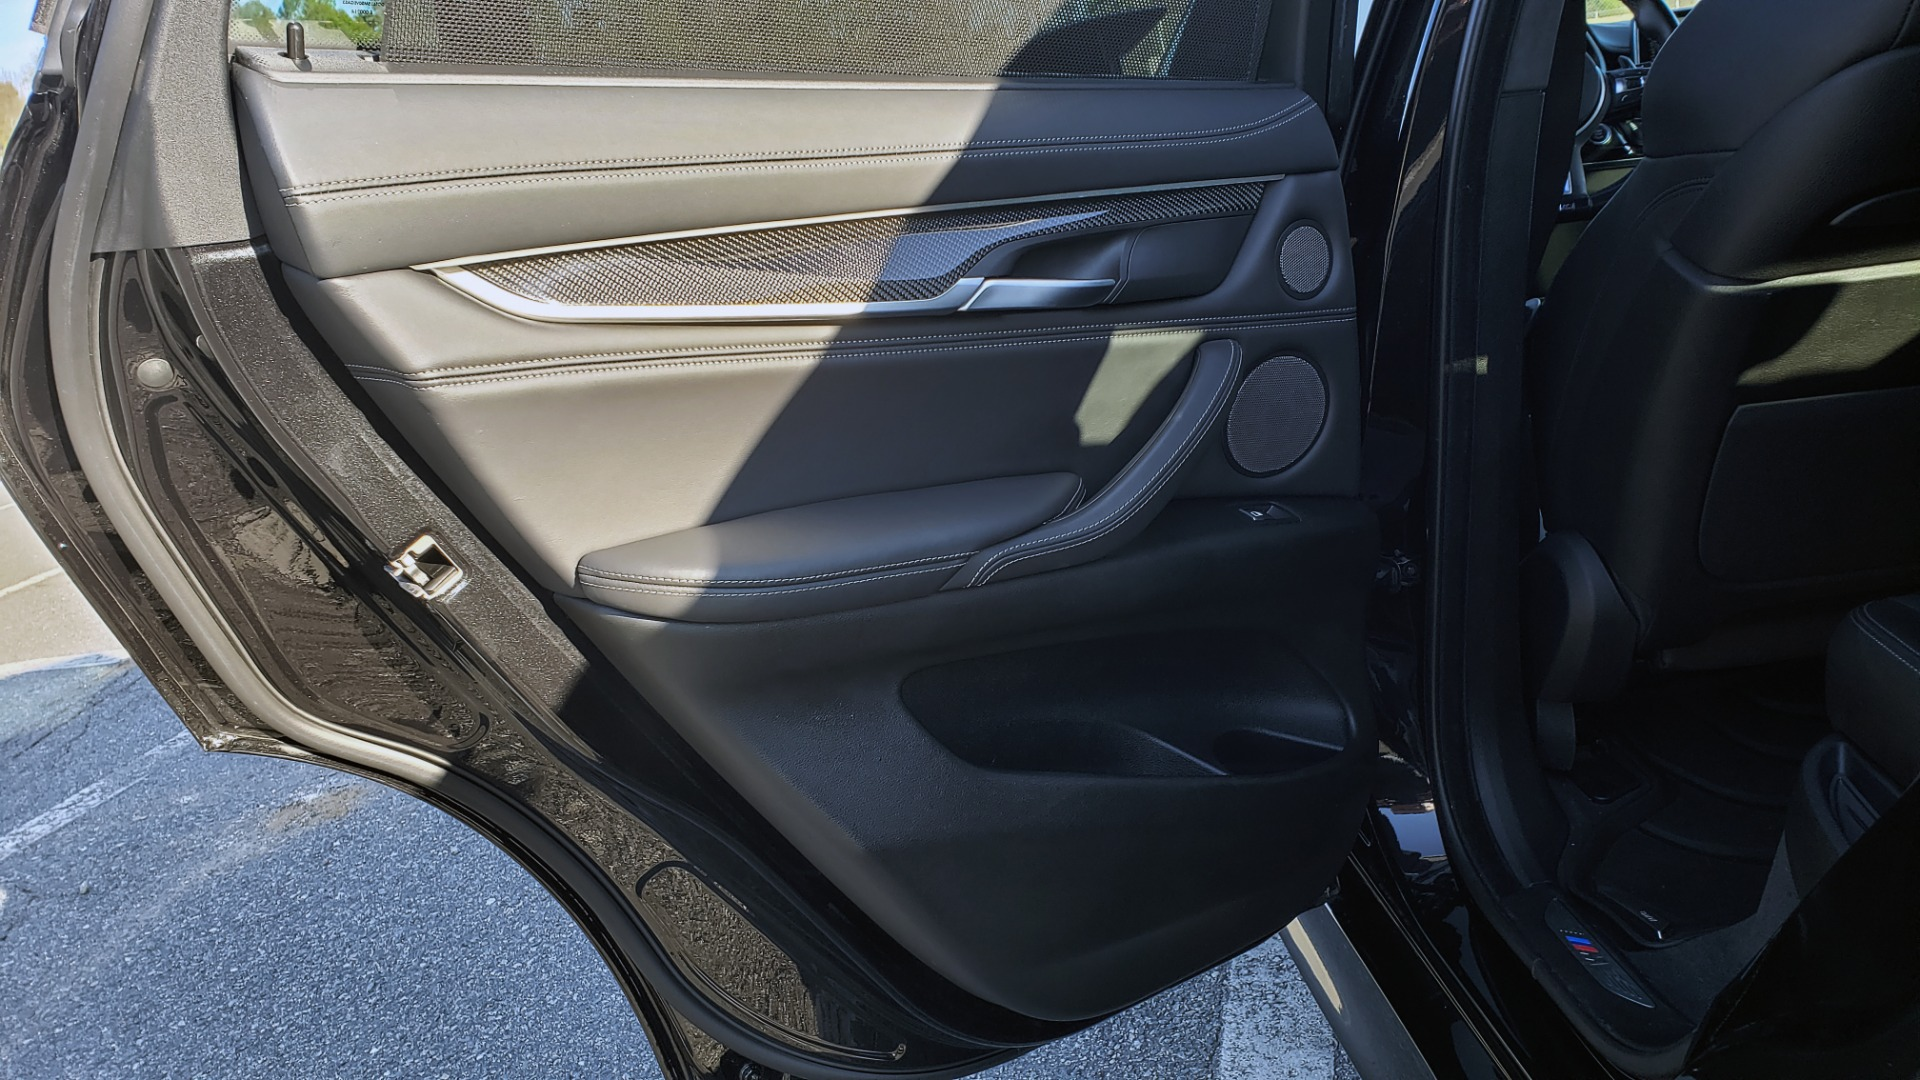 Used 2016 BMW X6 M EXEC PKG / DRVR ASST / NAV / SUNROOF / BLIND SPOT / REARVIEW for sale Sold at Formula Imports in Charlotte NC 28227 60